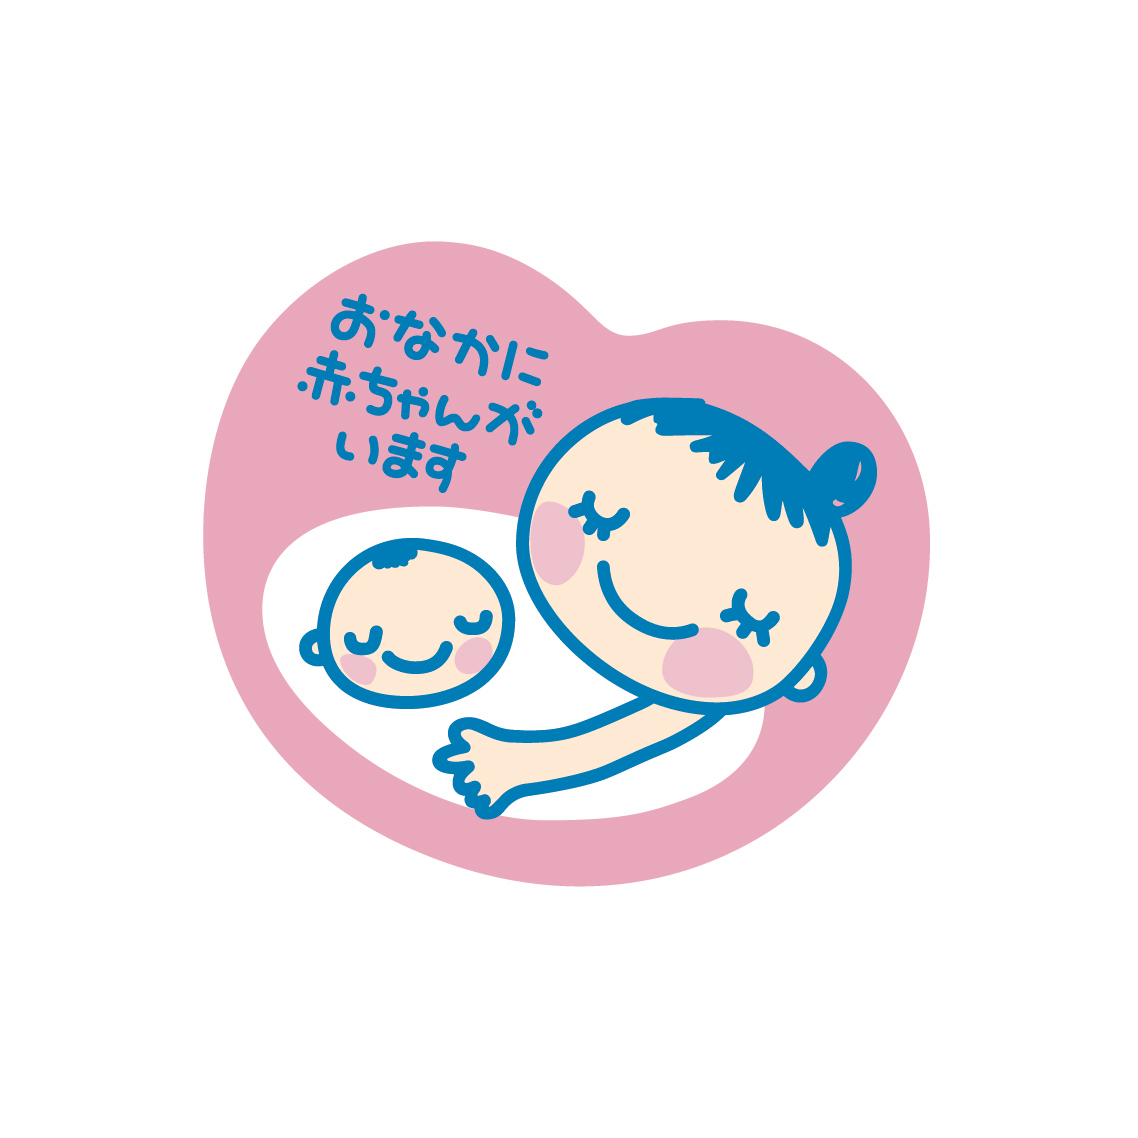 http://www.savian.jp/asset/c587b377ac68d302ffe39bcfd862bd3b61c94627.jpg